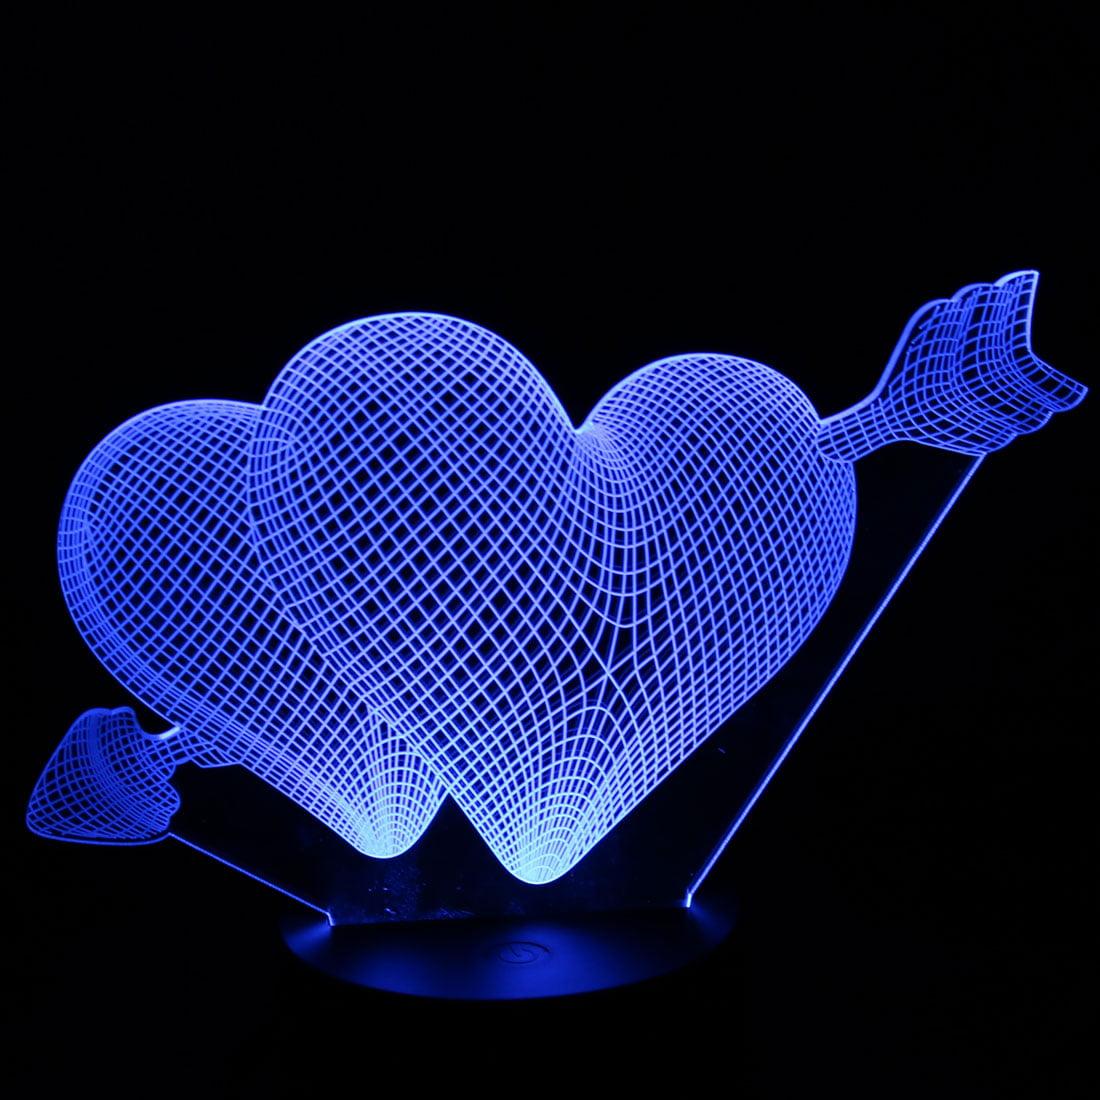 DC 5V Cupid Arrow 3D Acrylic LED Night Light 7 Color Change Desk Table Lamp - image 1 of 7